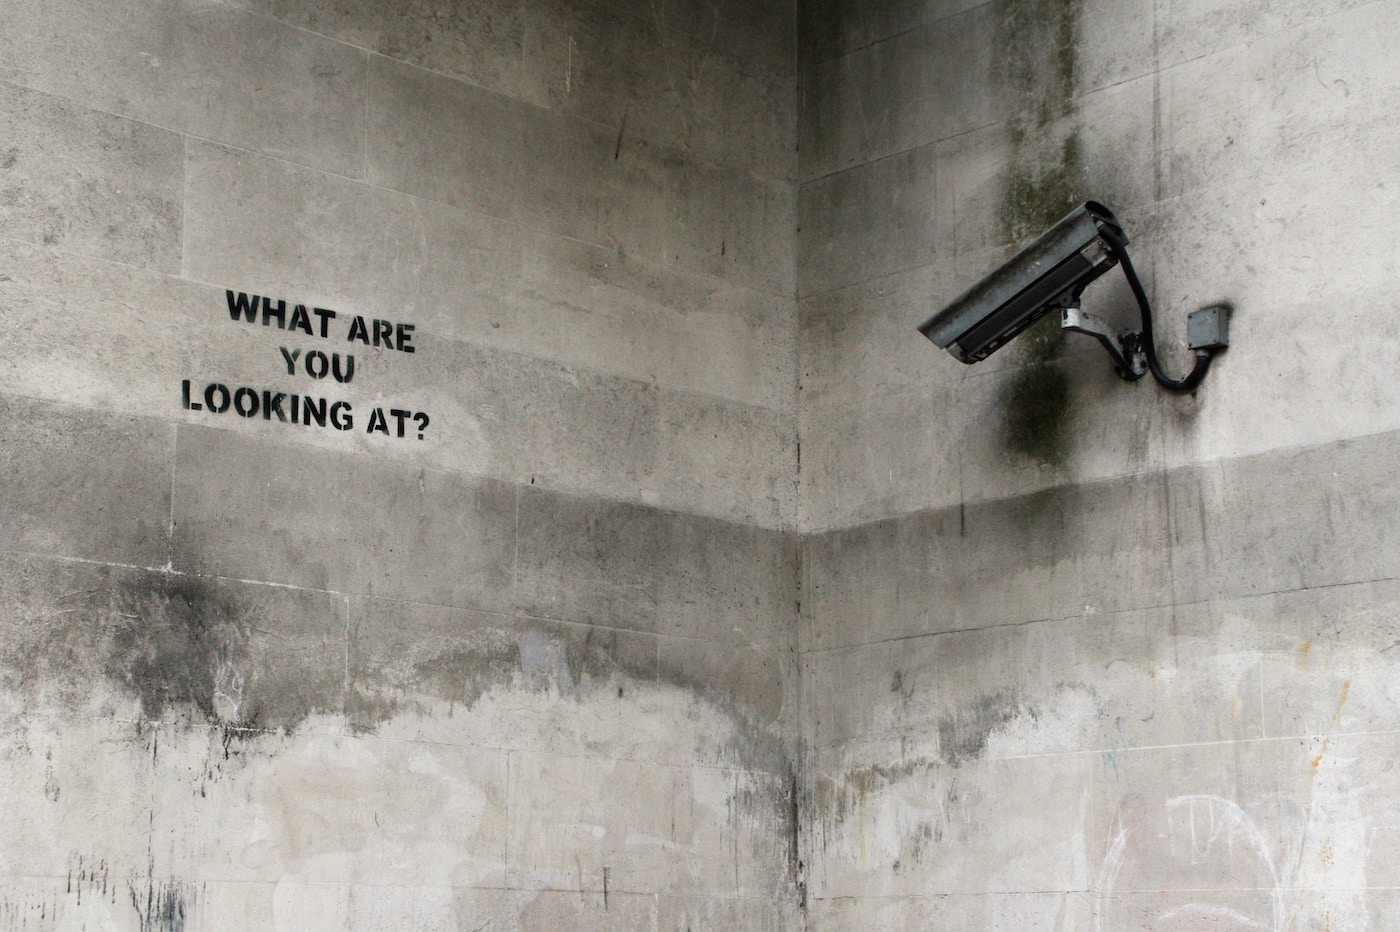 camera de surveillance classement